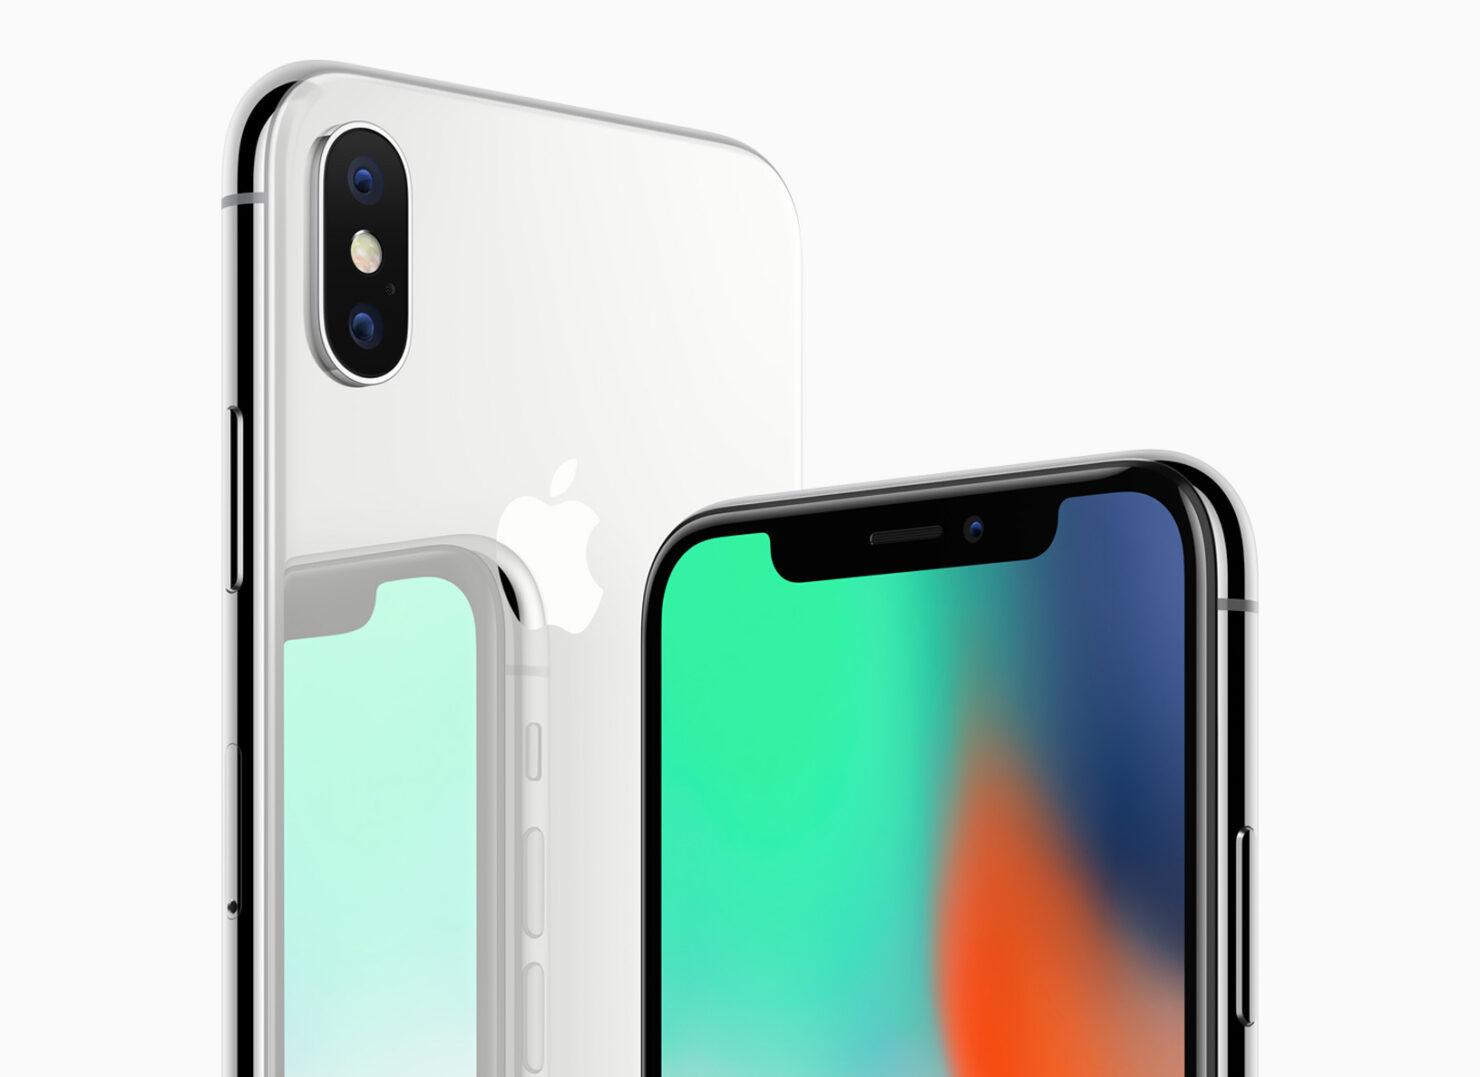 iPhone X most popular smartphone Q1 2018